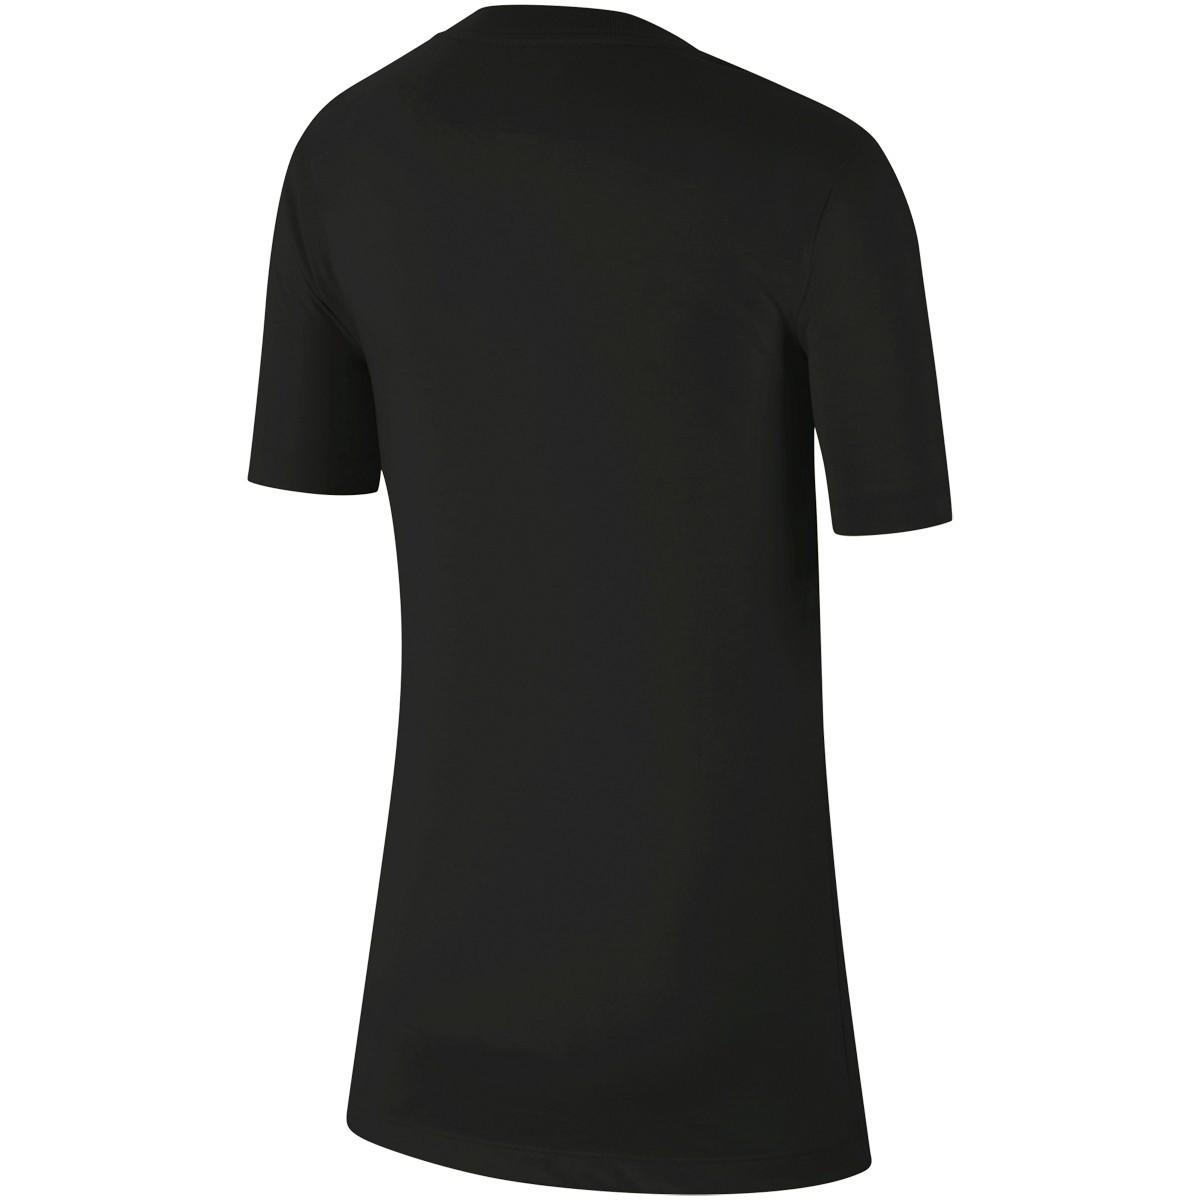 Теннисная футболка детская Nike Dry Tee Rafa black/volt